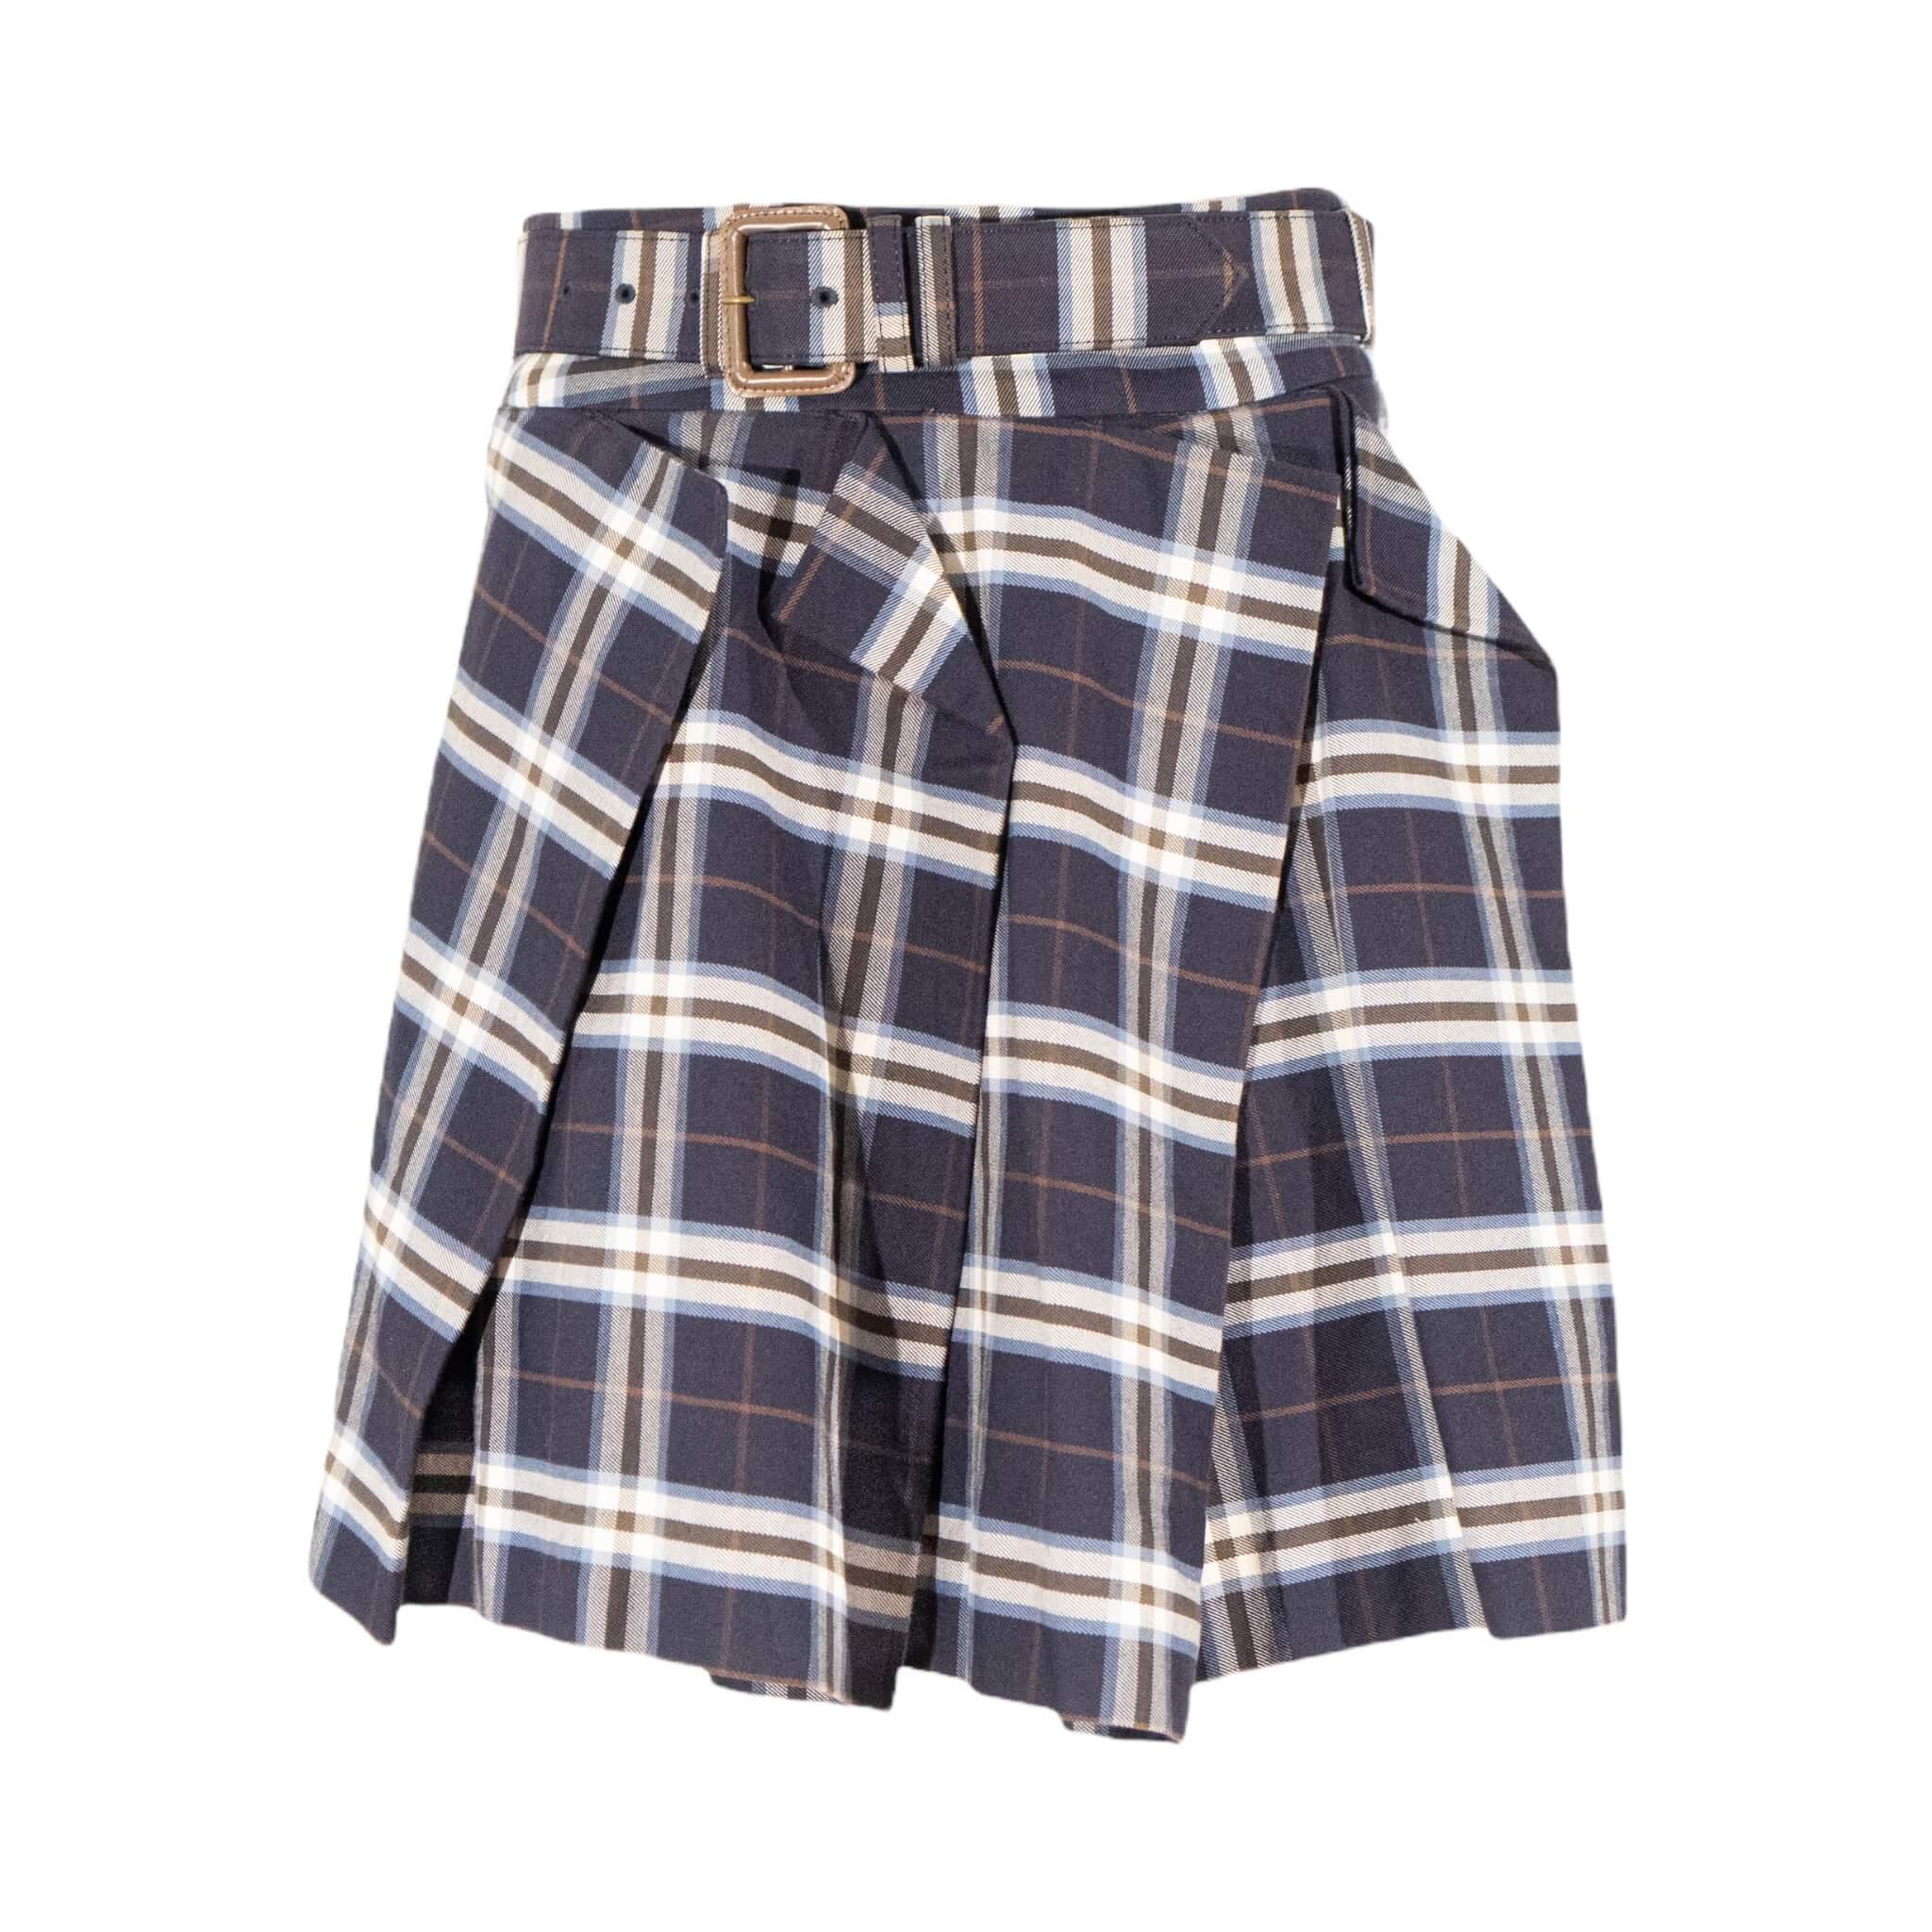 Vivienne Westwood Plaid Belted Skirt